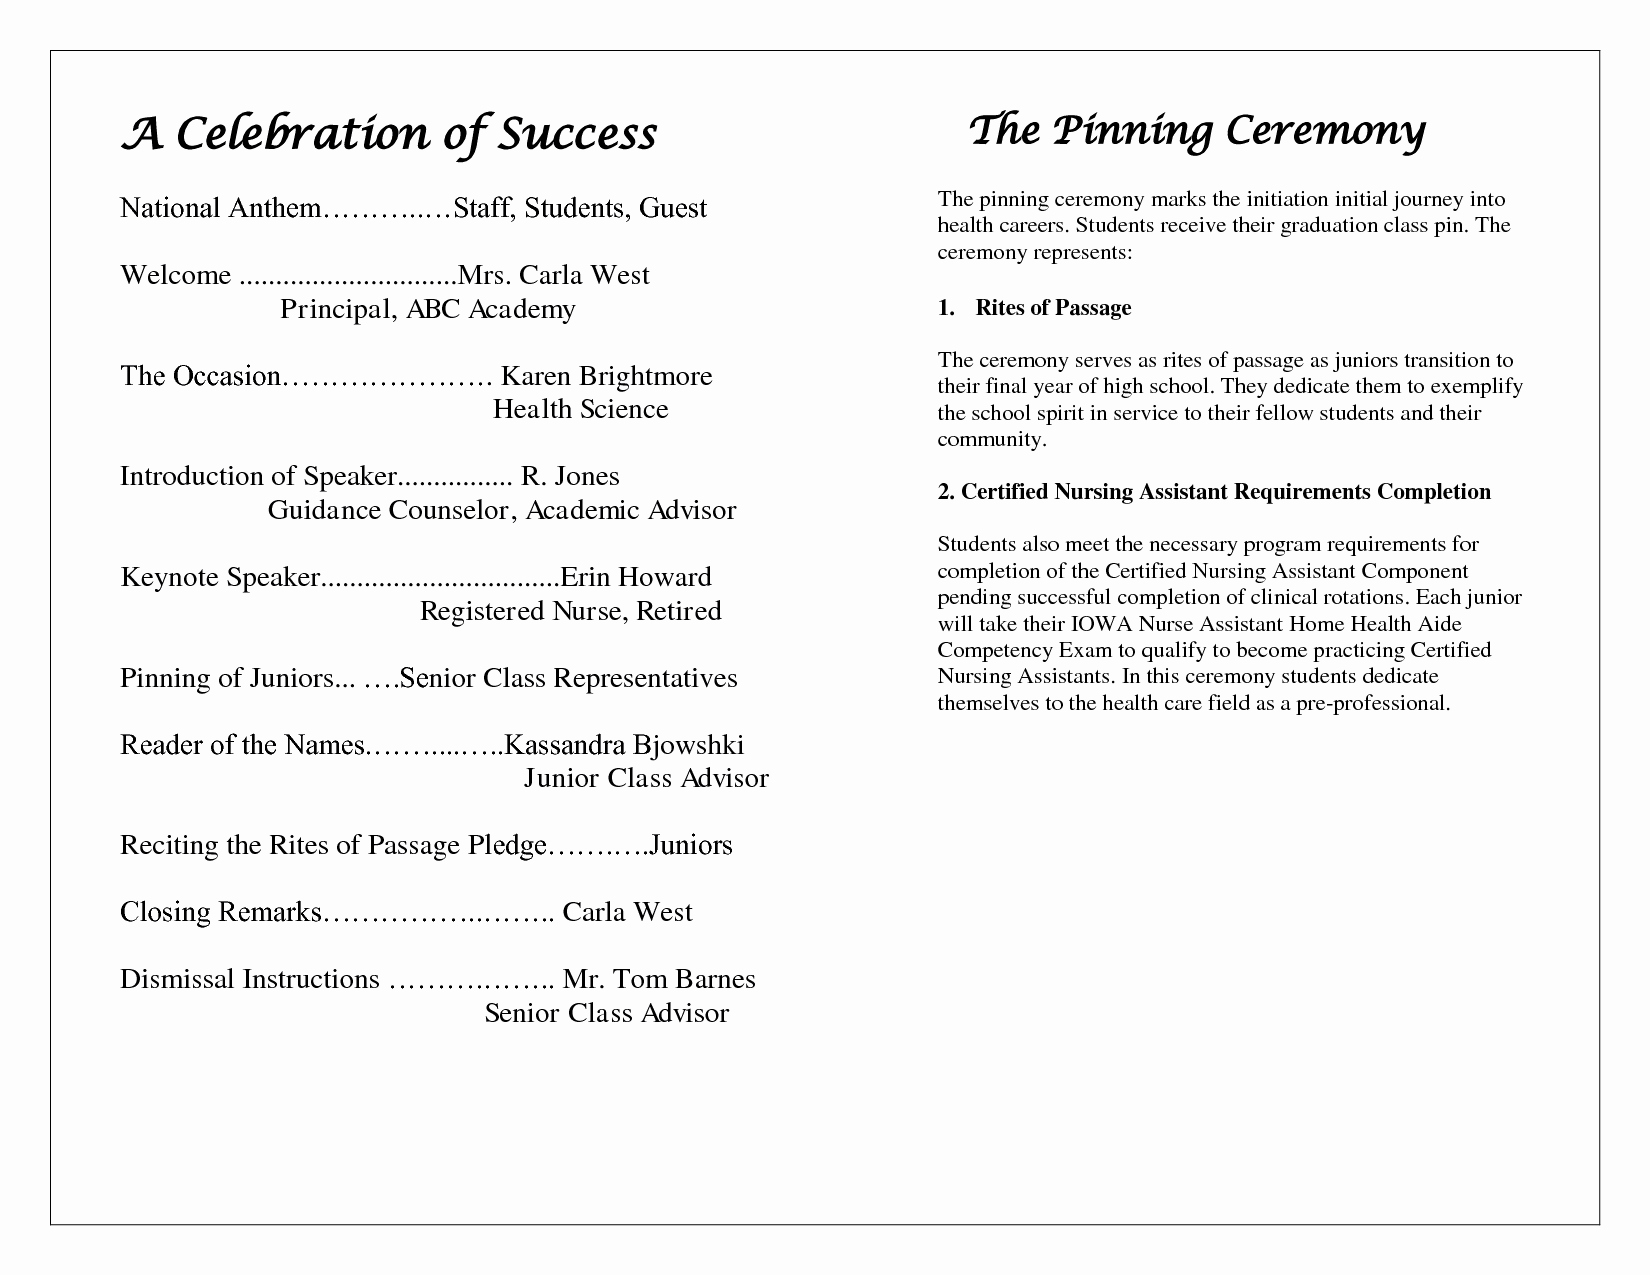 Preschool Graduation Programs Template New Award Ceremony Program Template – Free Download – December